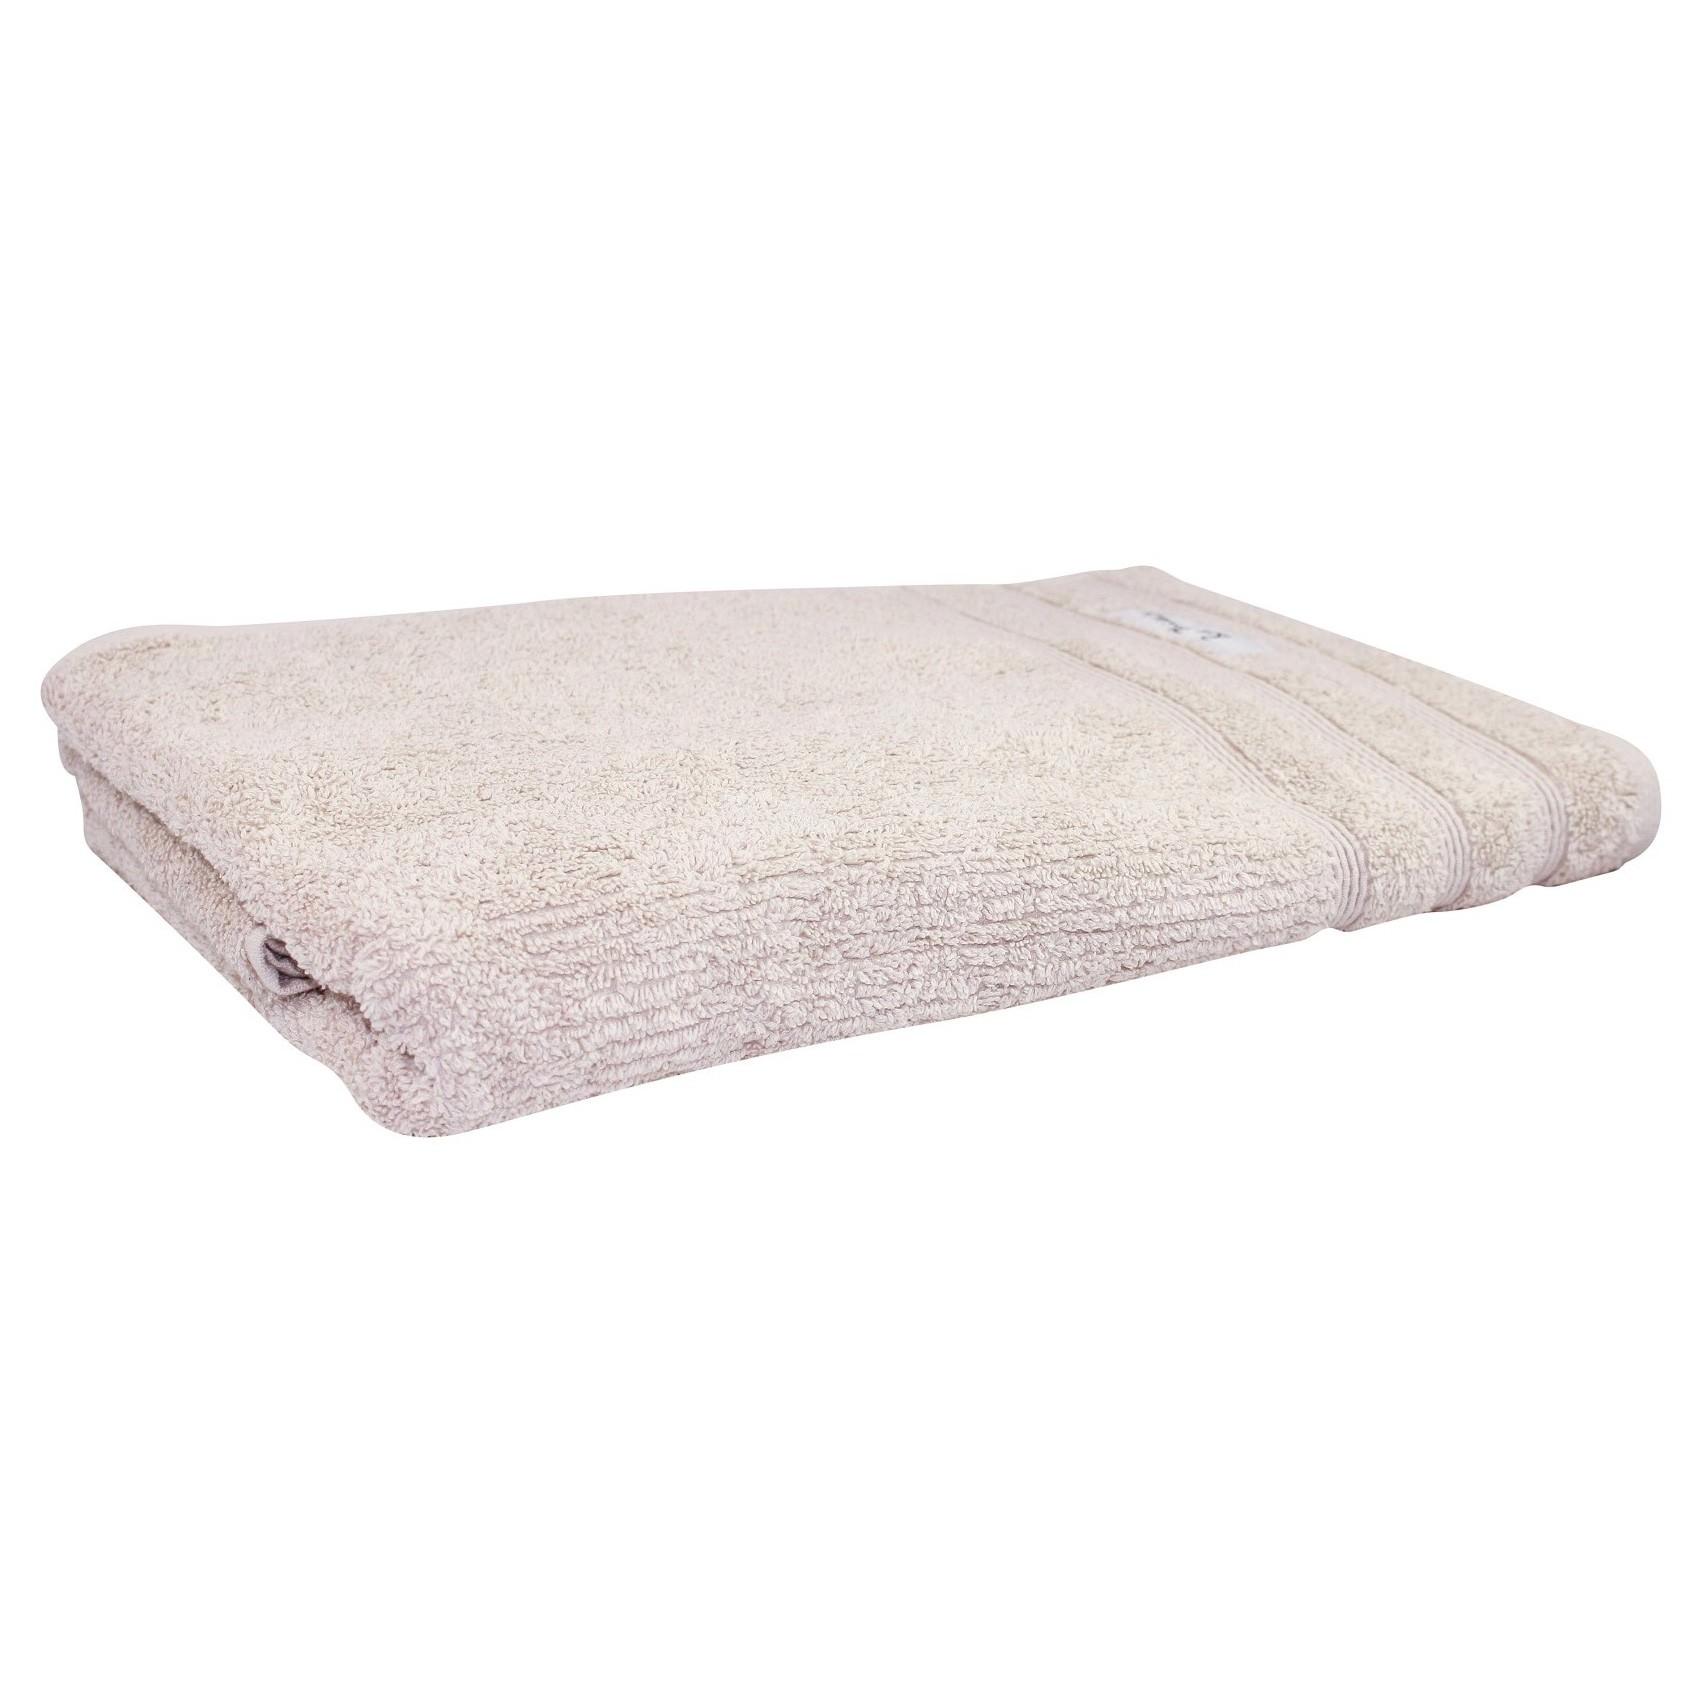 Bas Phillips Cairo Egyptian Cotton Bath Sheet, Desert